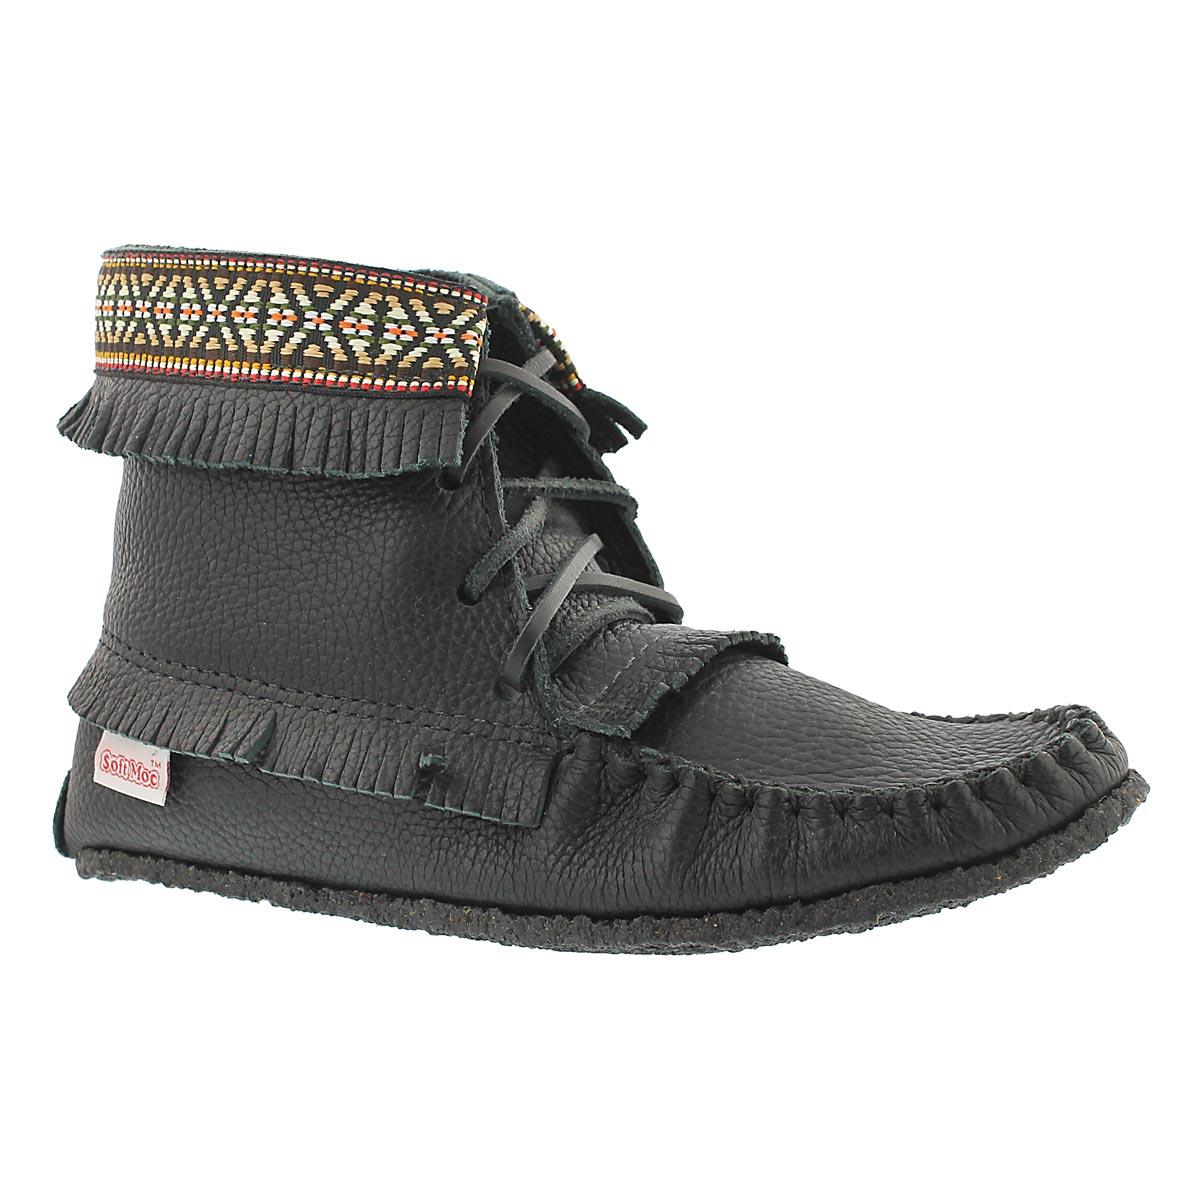 Women's 137597 black fringe bootie moccasins